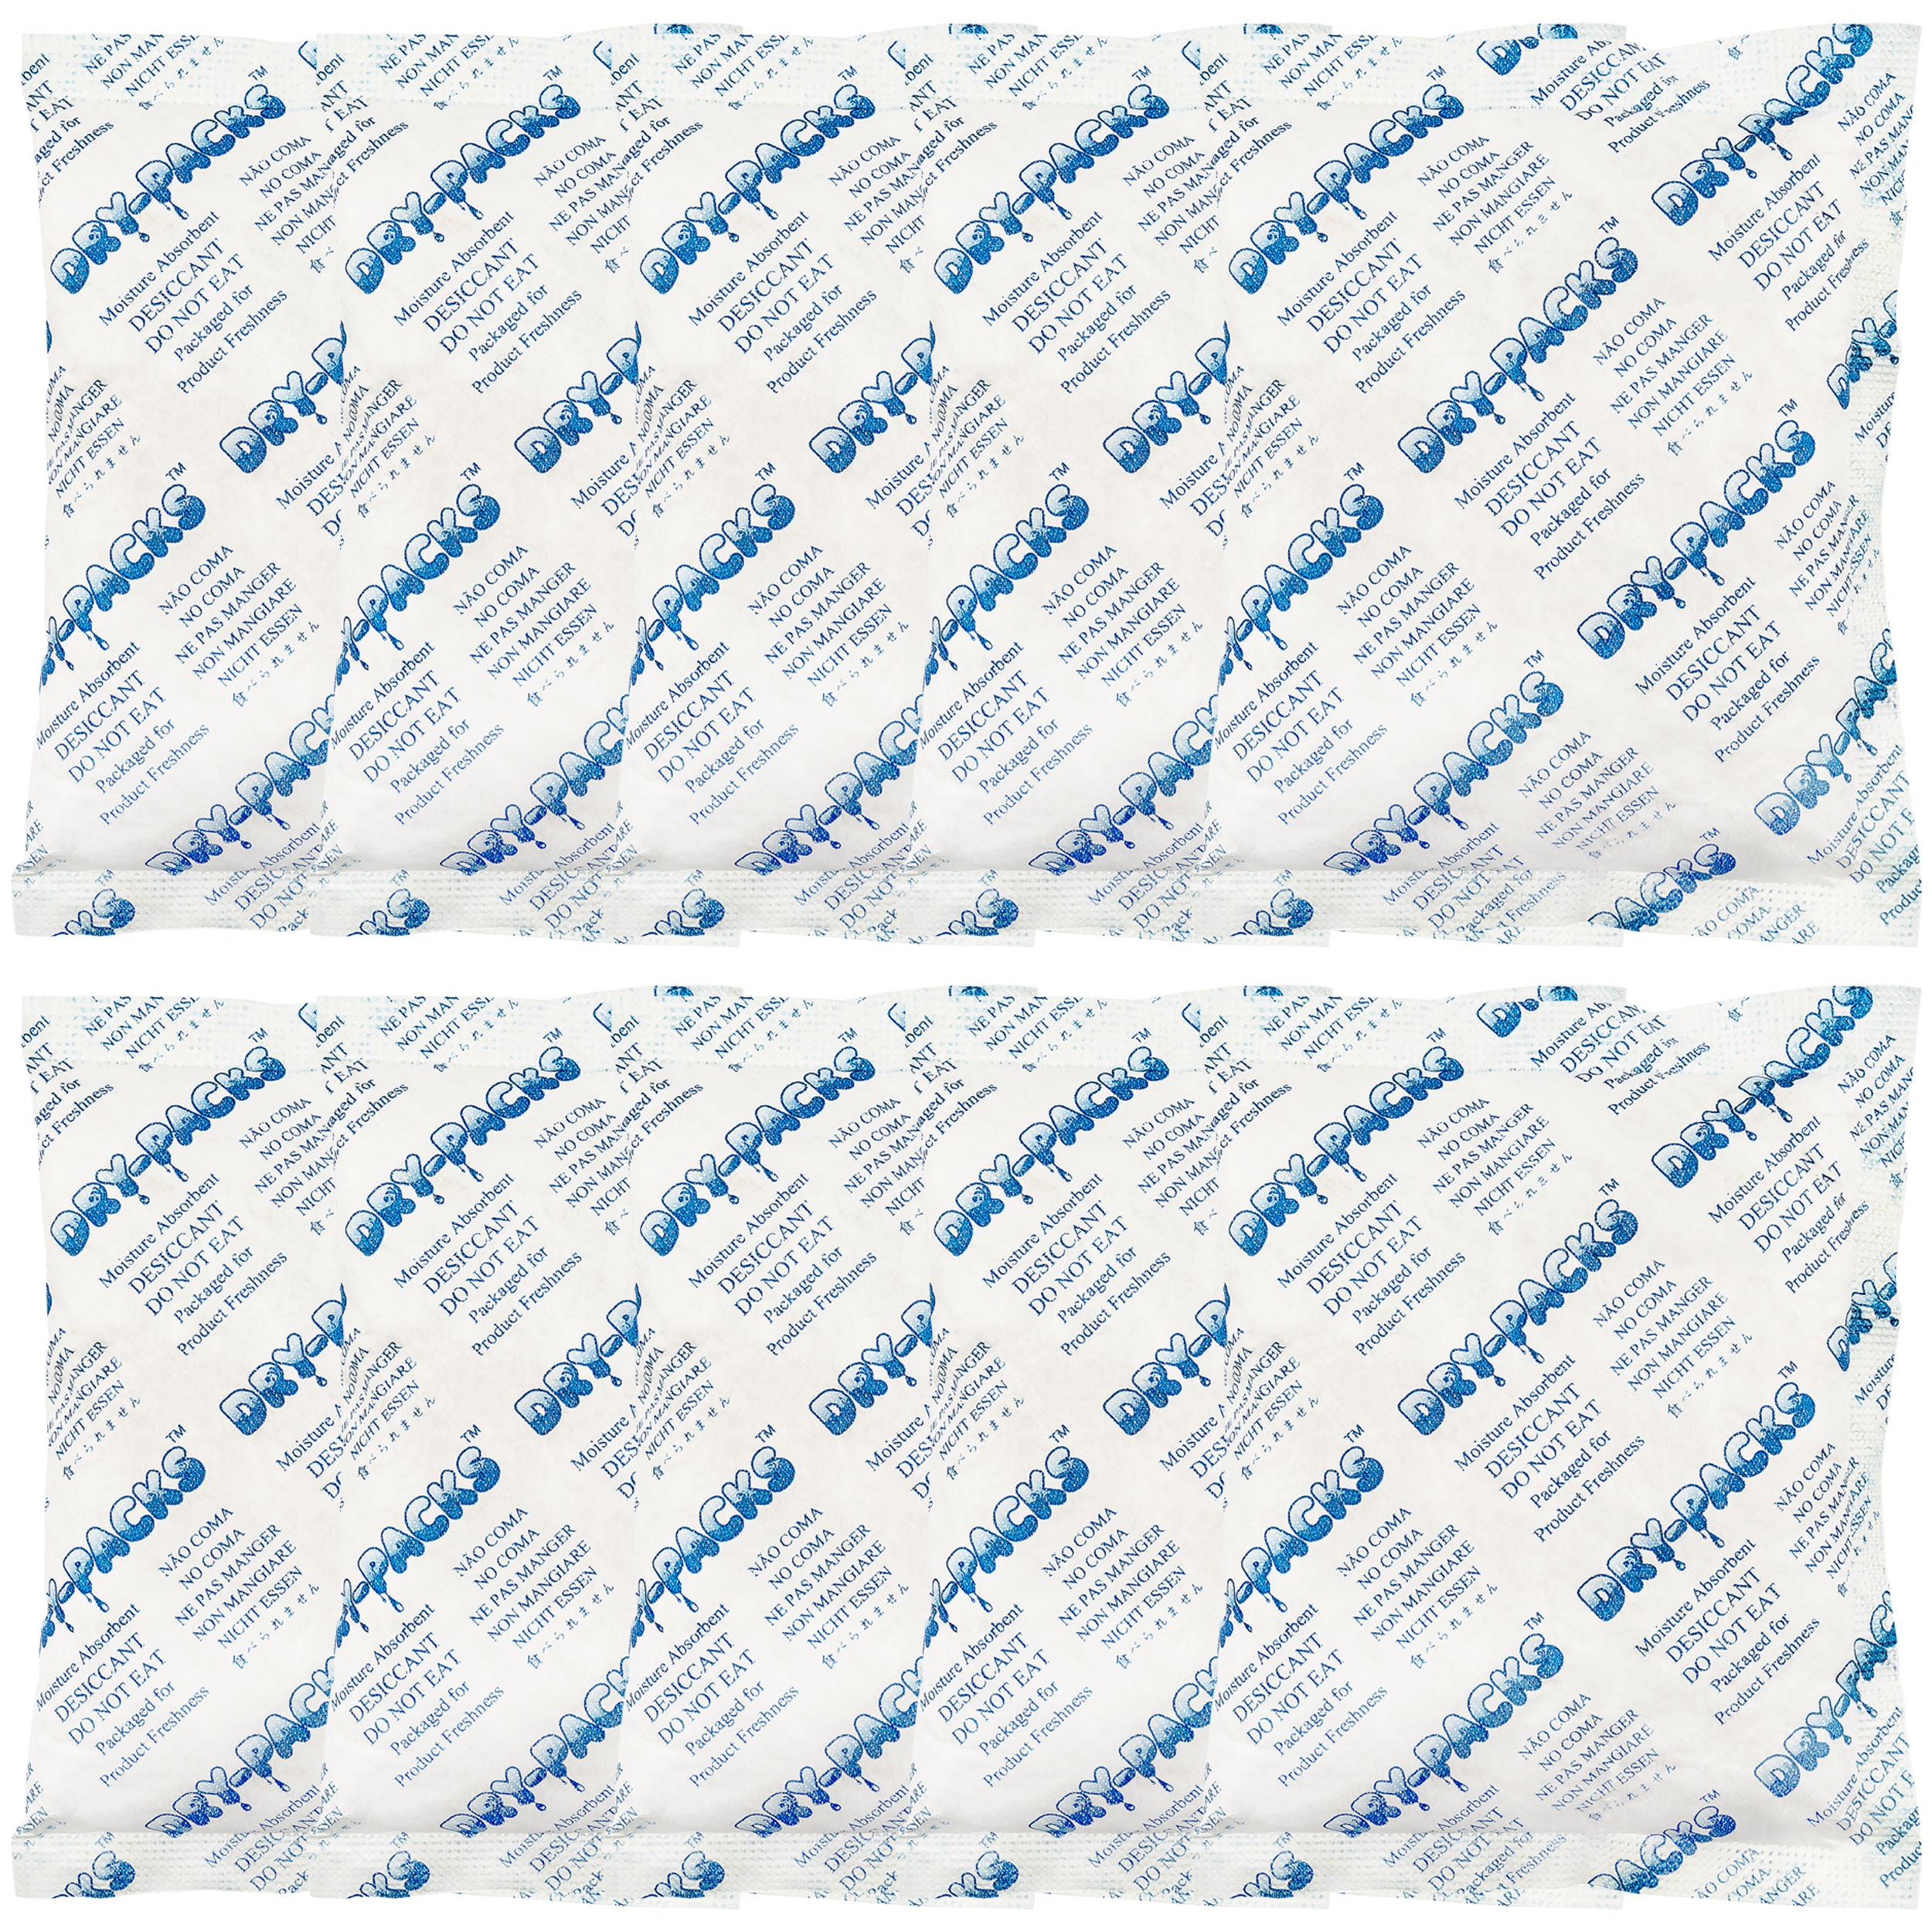 100 Gram X 10 PK Silica Gel Desiccant Moisture Absorber -FDA Compliant Food Safe